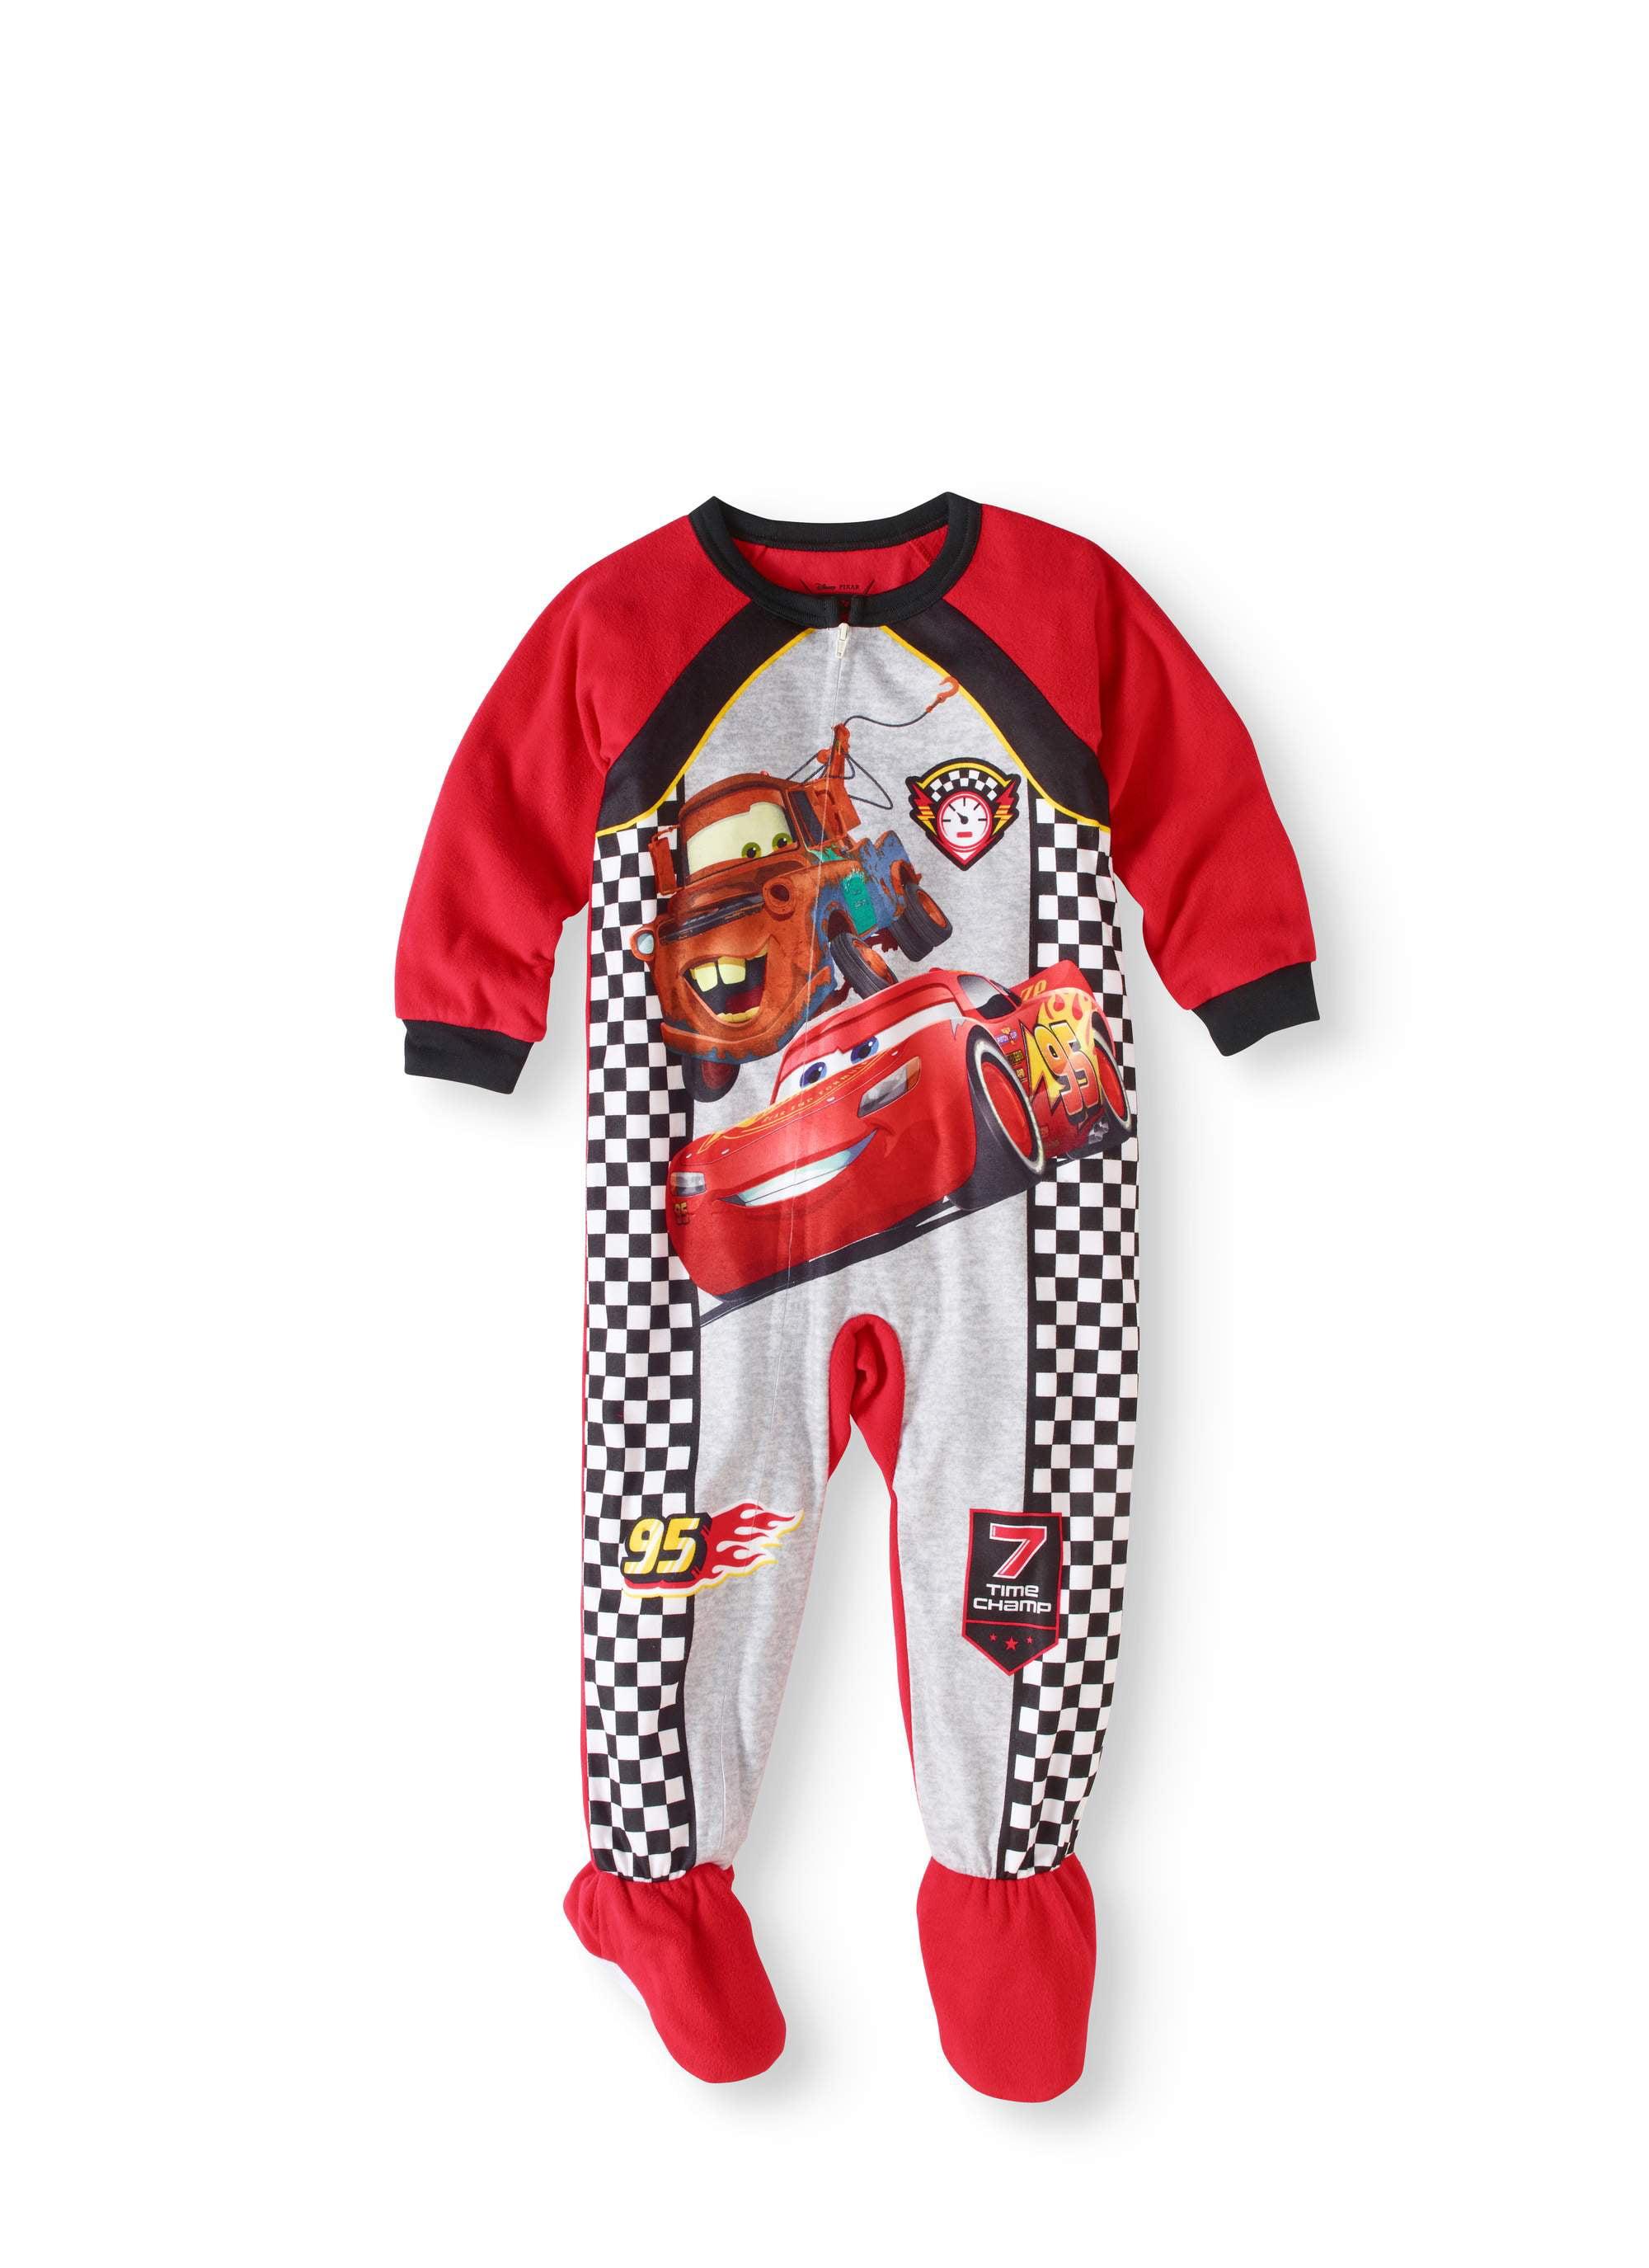 Toddler Boys Licensed Sleepwear